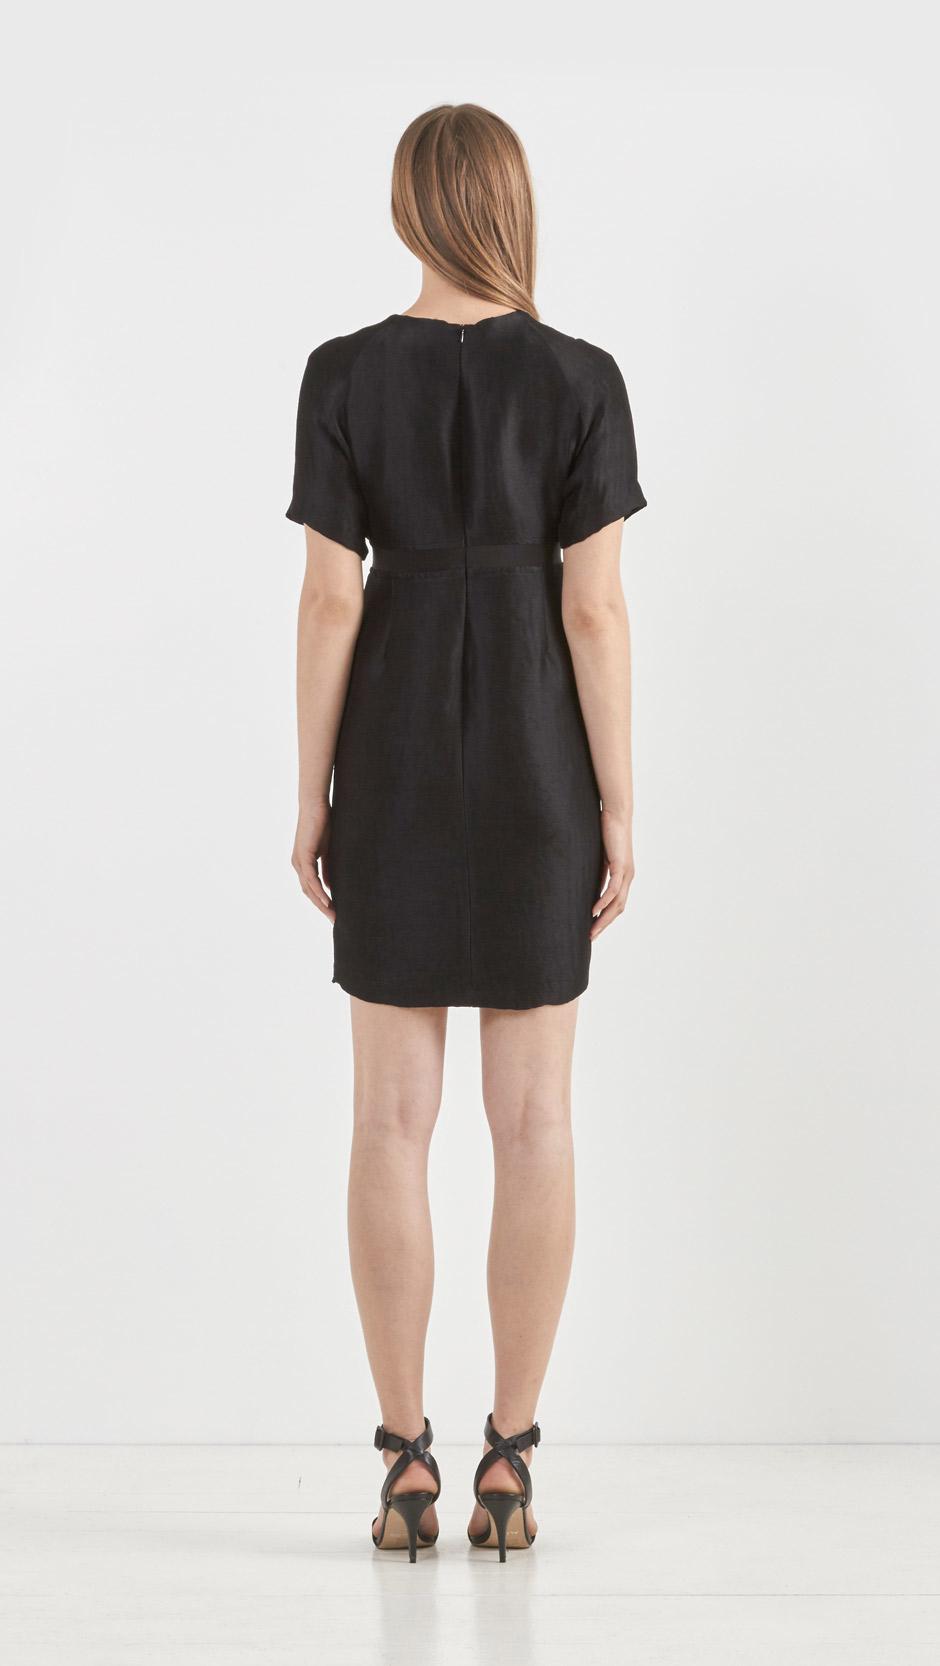 DRESSES - Short dresses Avelon wrwu18Ipz